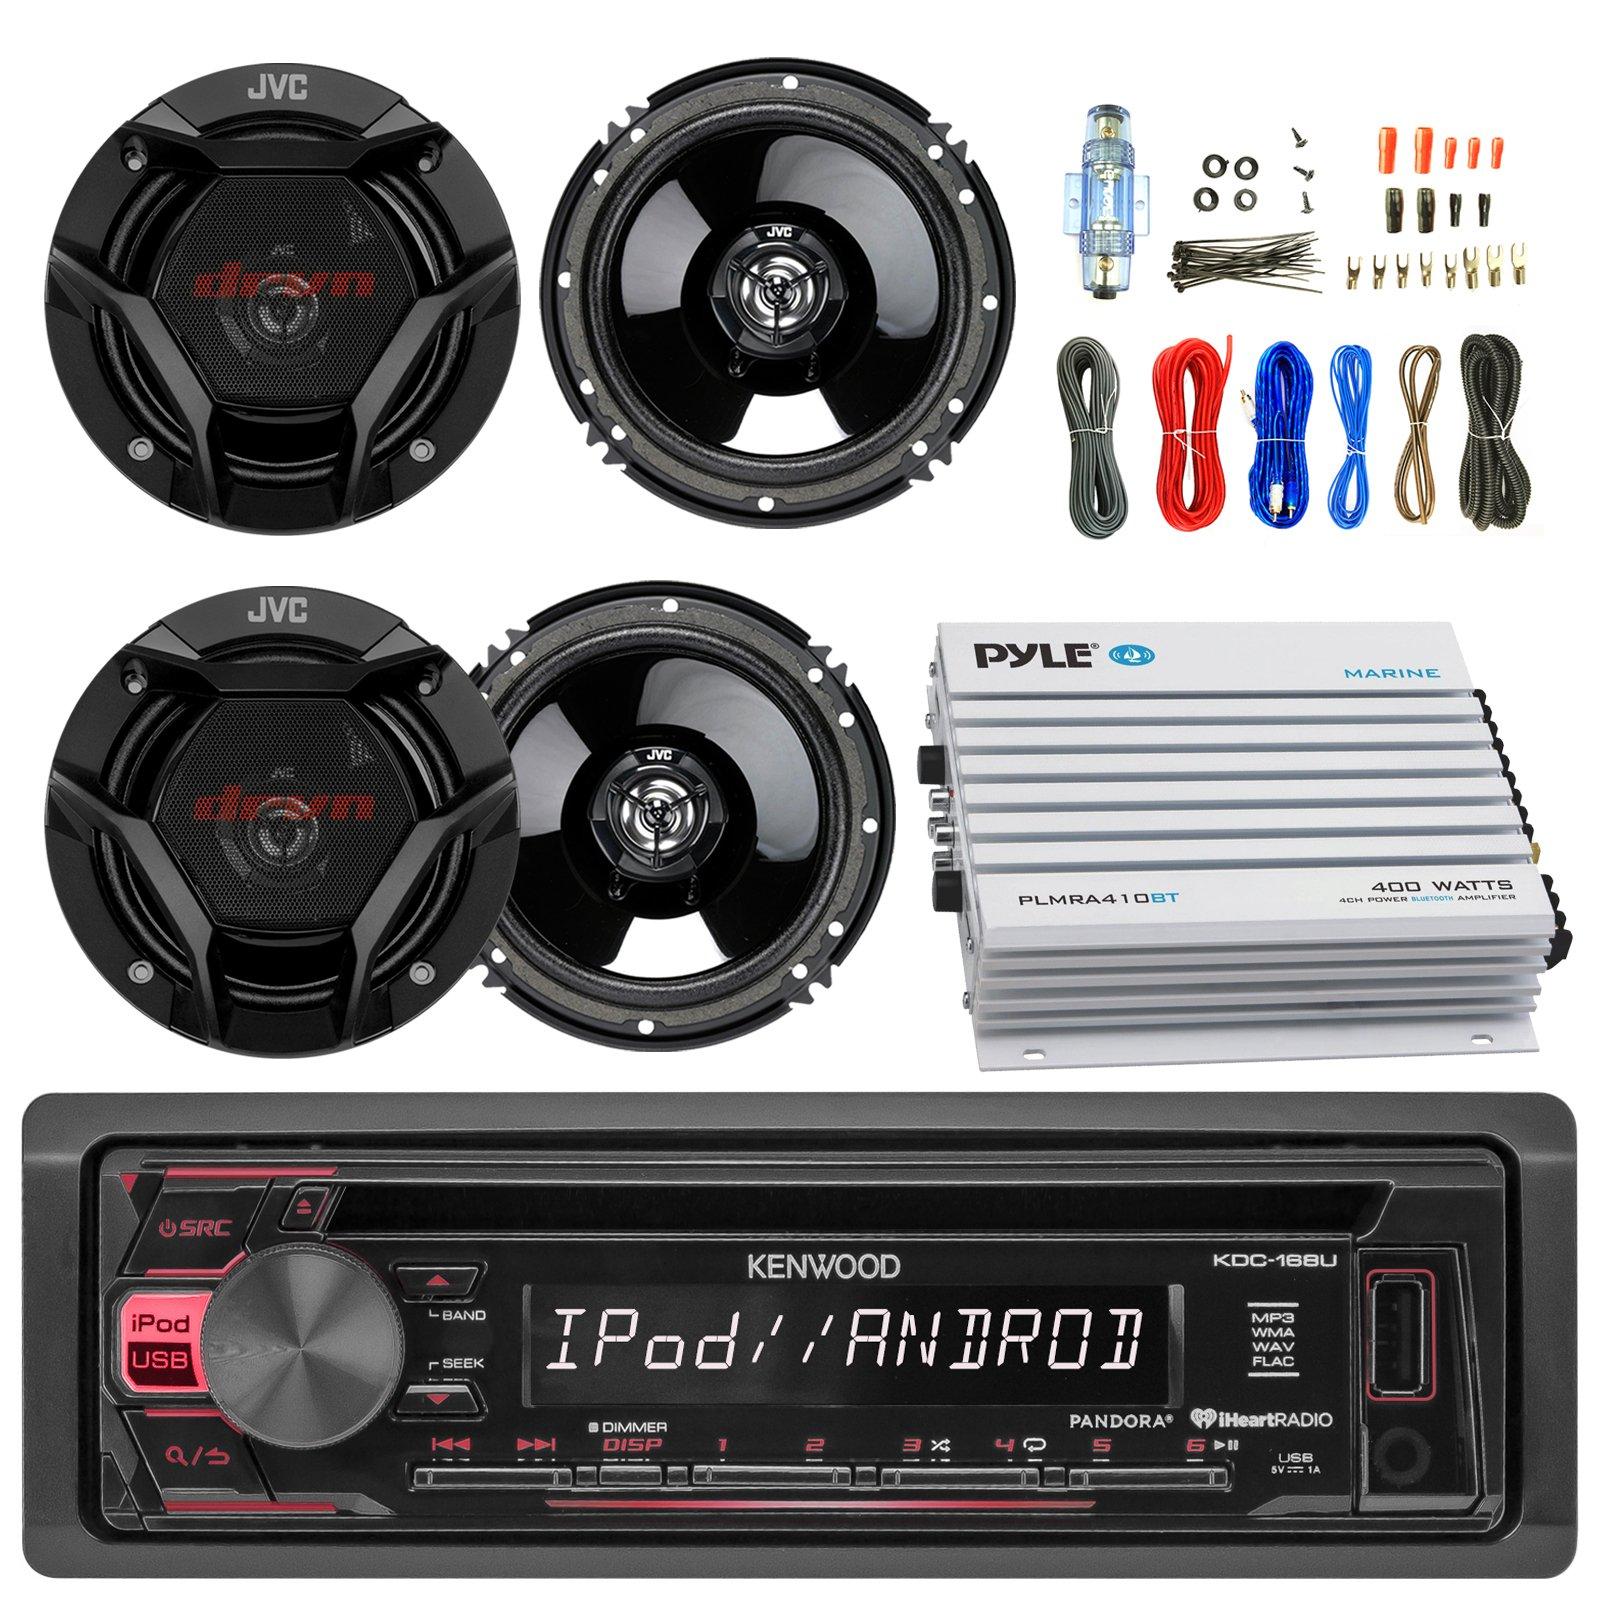 Kenwood KDC168U Car CD Player Receiver USB AUX Radio - Bundle Combo With 4x JVC CSDR620 6.5'' Inch 300-Watt 2-Way Black Audio Coaxial Speakers + + 4-Channel Amplifier + Amp Kit